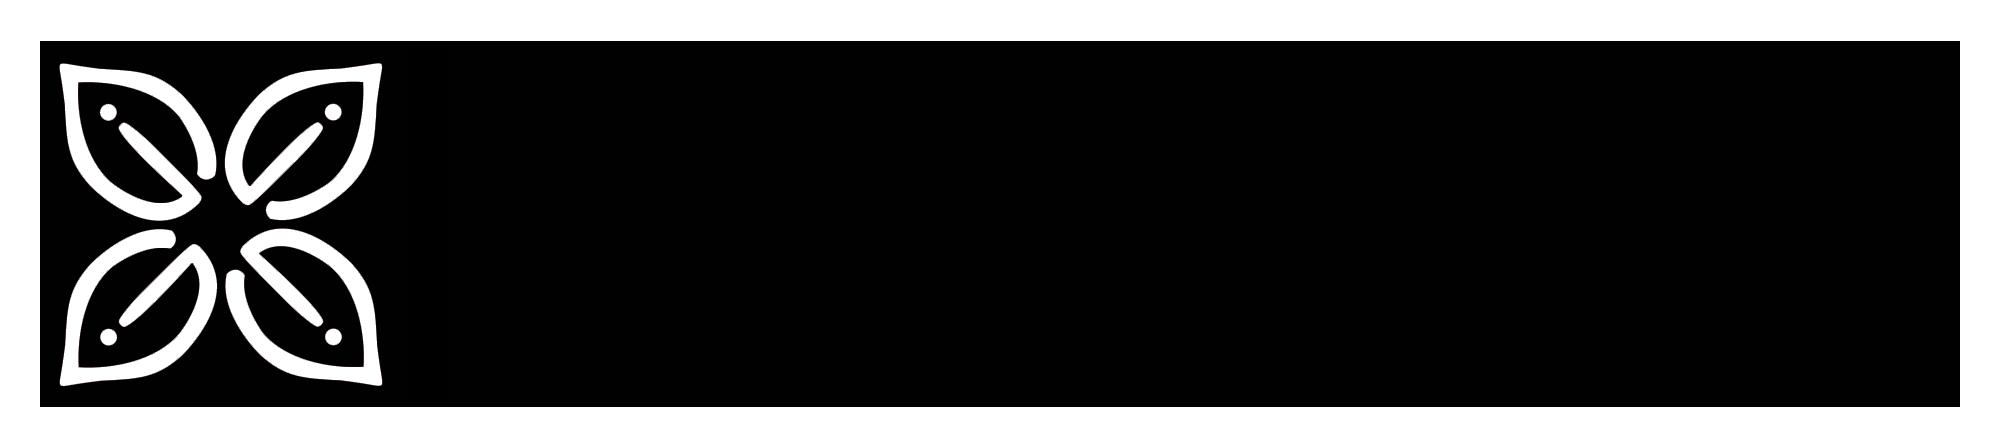 Hilton-Garden-Inn-Logo-Wallpaper.png